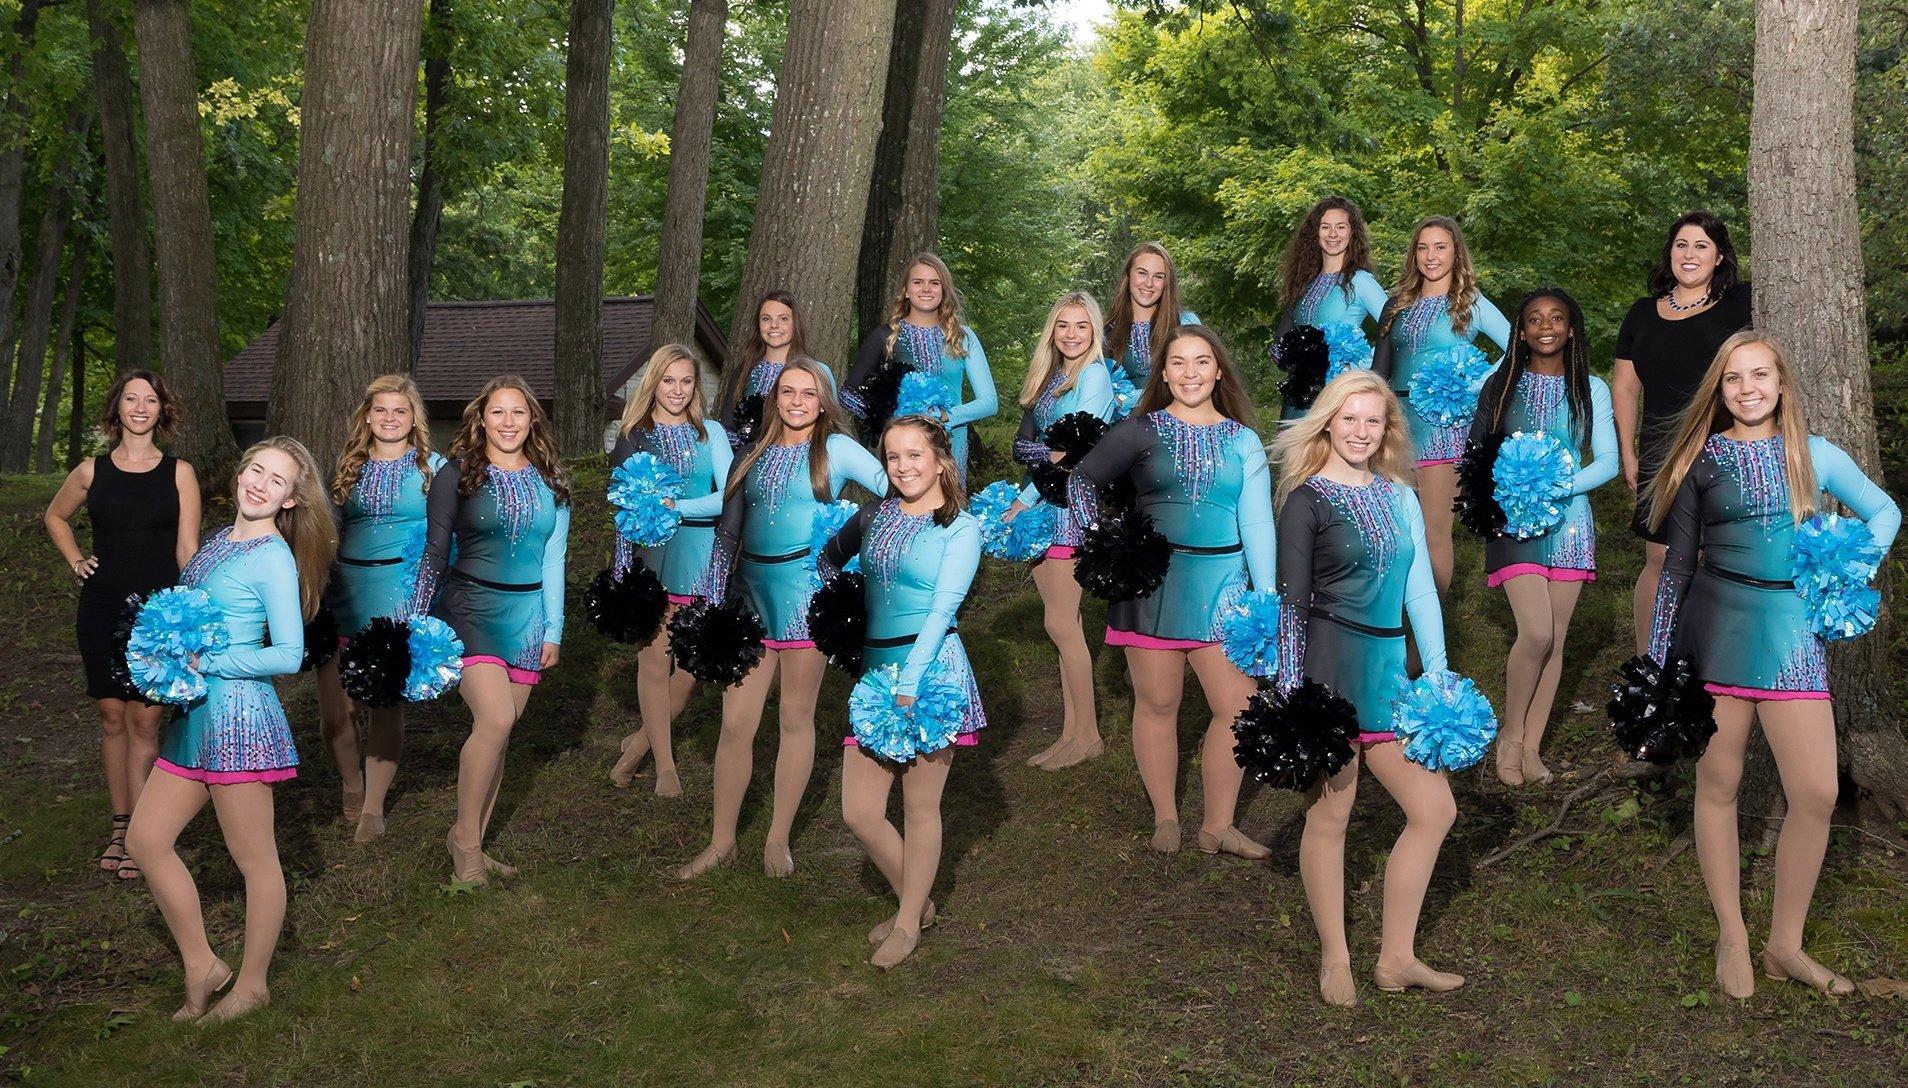 west bend west dance team color change pom uniform